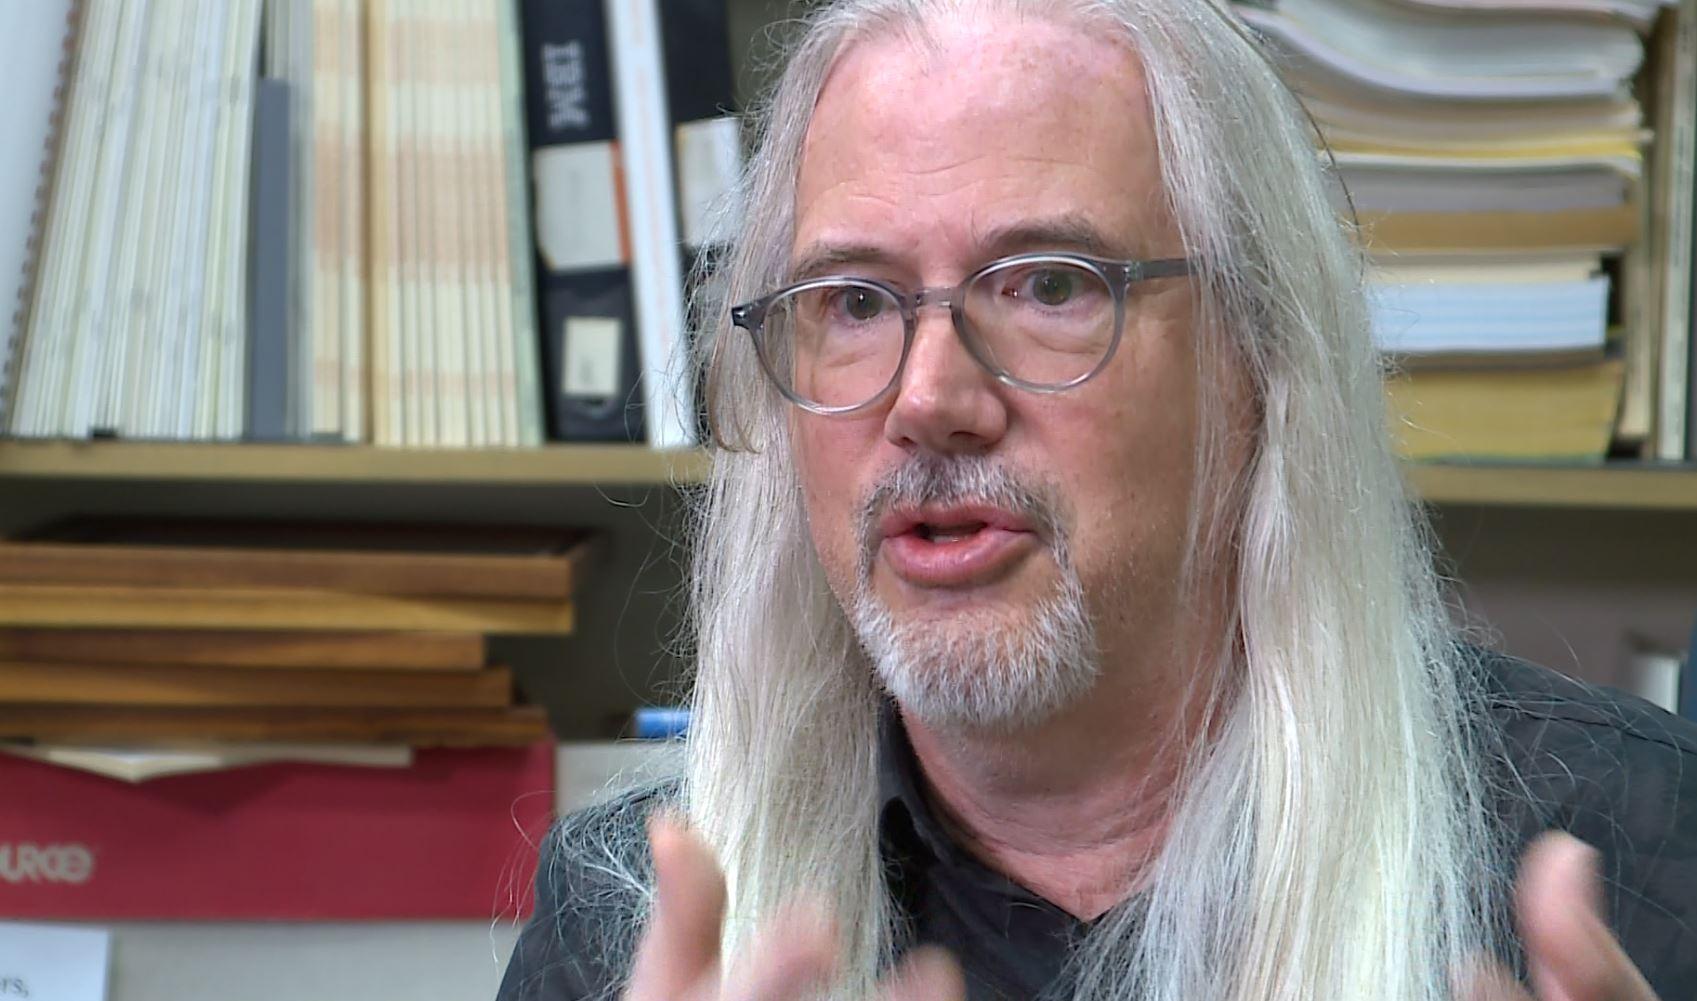 UT Professor and Civil Engineer Ben Hodges. (KXAN Photo/Chris Nelson)